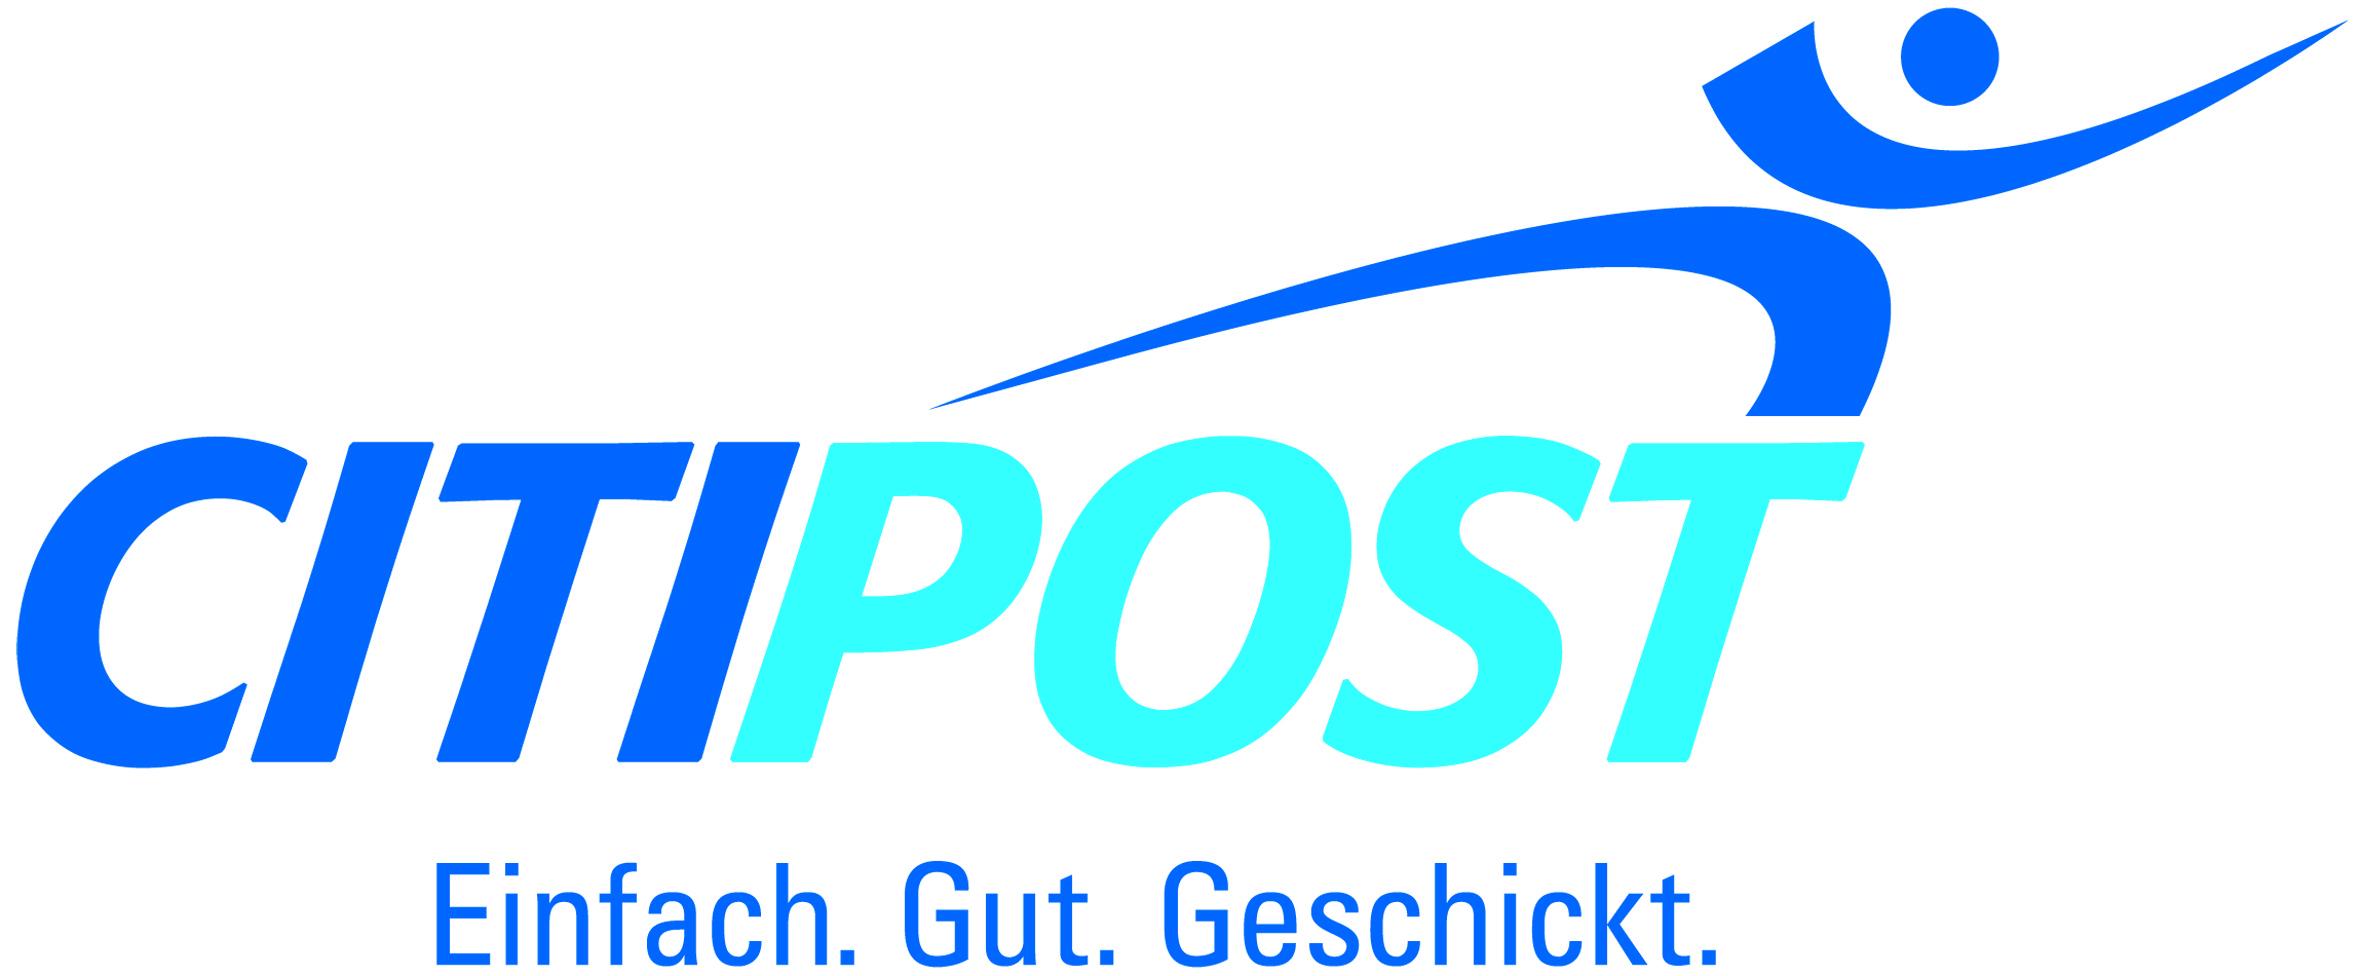 CITIPOST_Logo_20cm_CMYK